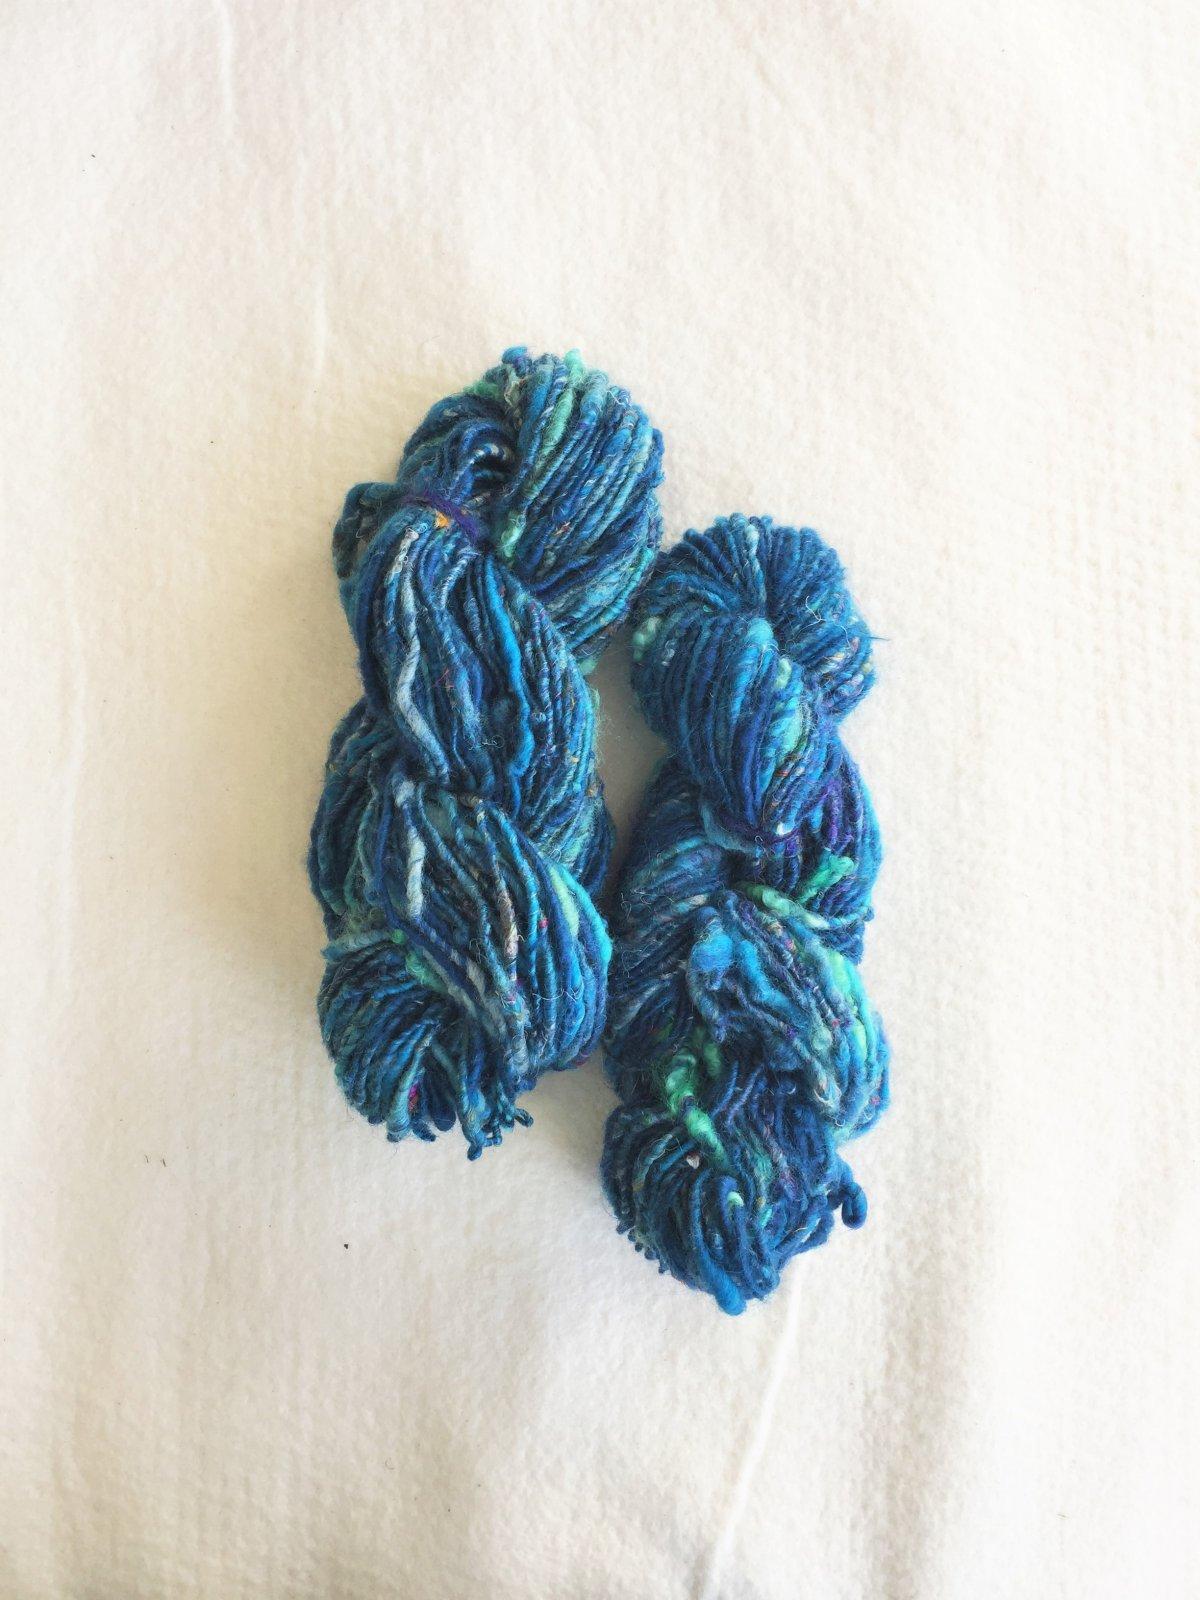 Blue Wave - Fibers by Laura - Handspun Merino Wool, Sari Silk, Wool Locks and Mohair - Super Bulky Weight Yarn